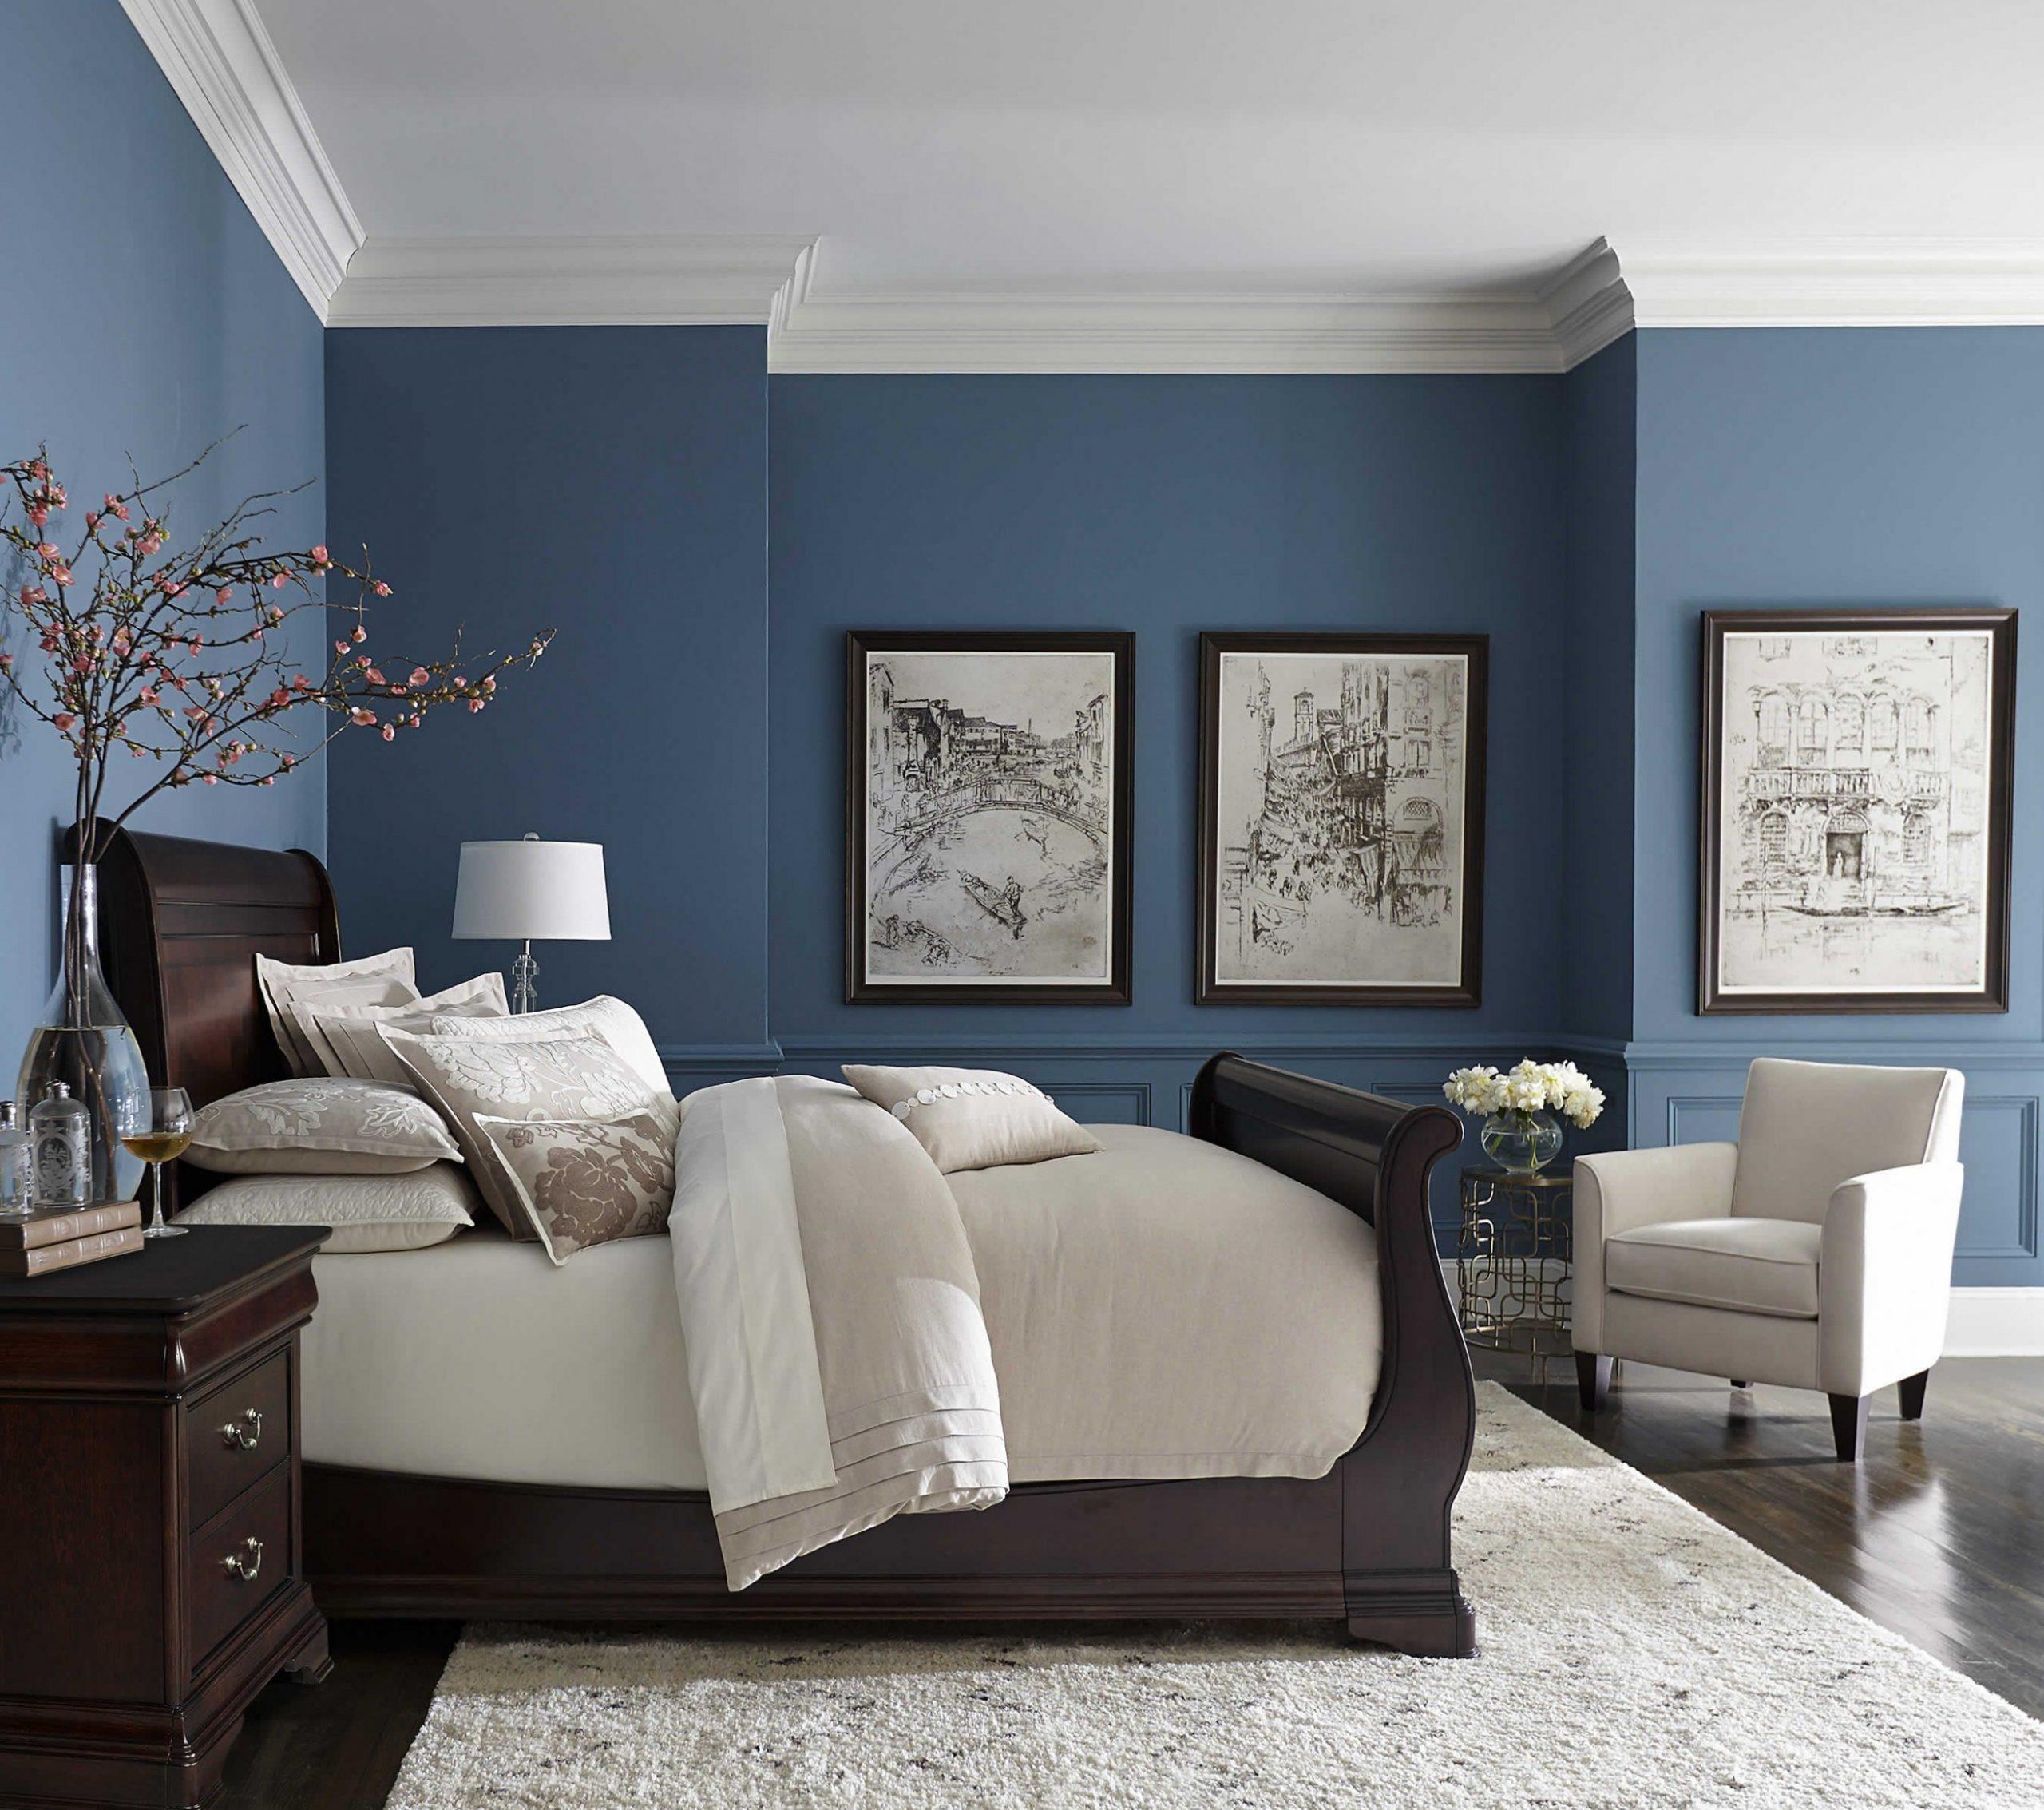 Effortlessly Elegant  Small master bedroom, Master bedrooms decor  - Bedroom Ideas Blue